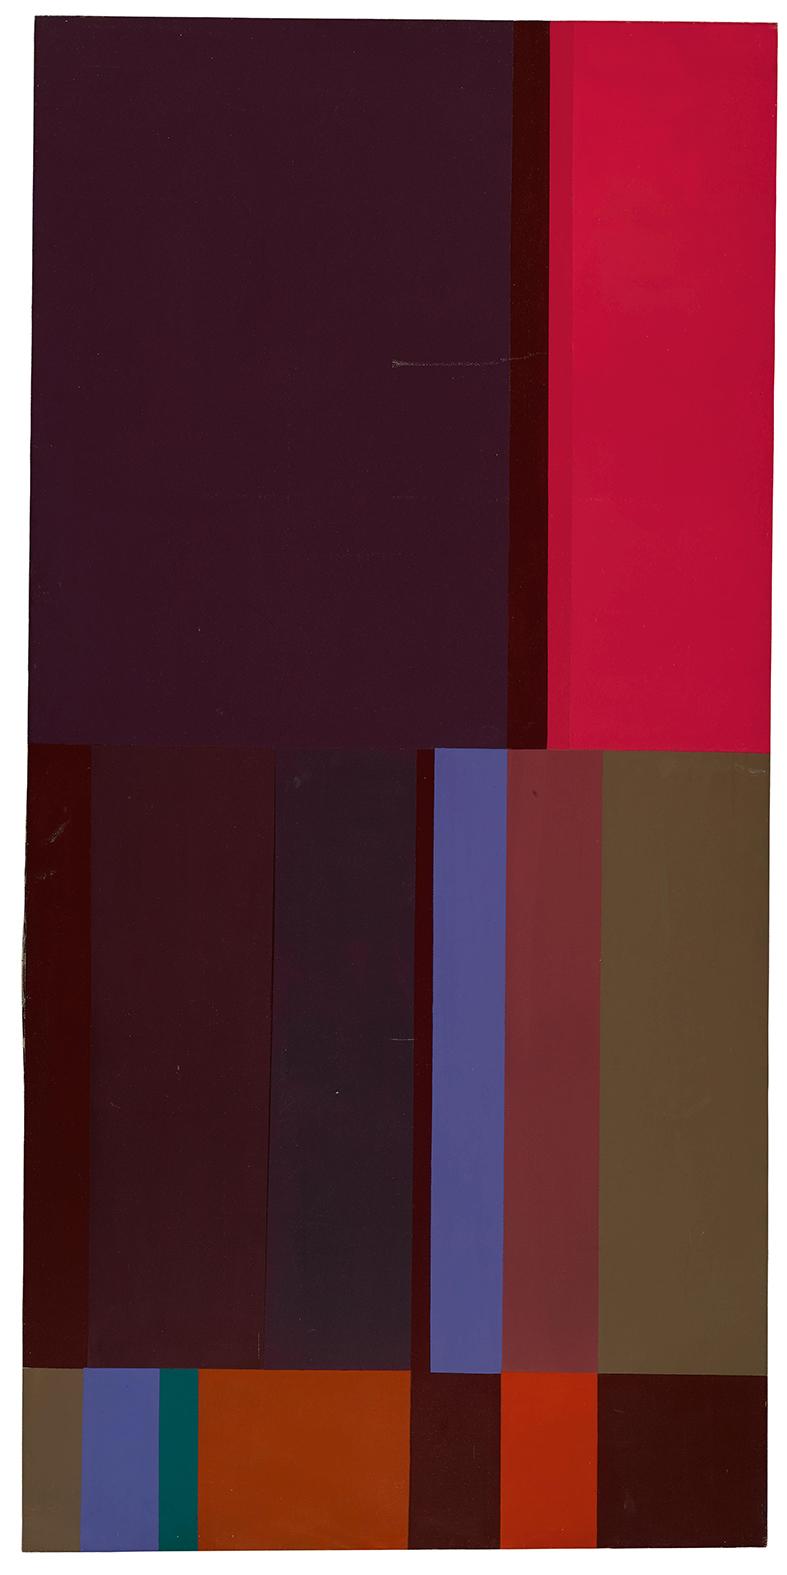 Mercedes Pardo Composición 1978. Sothebys, mayo 2007 NY.